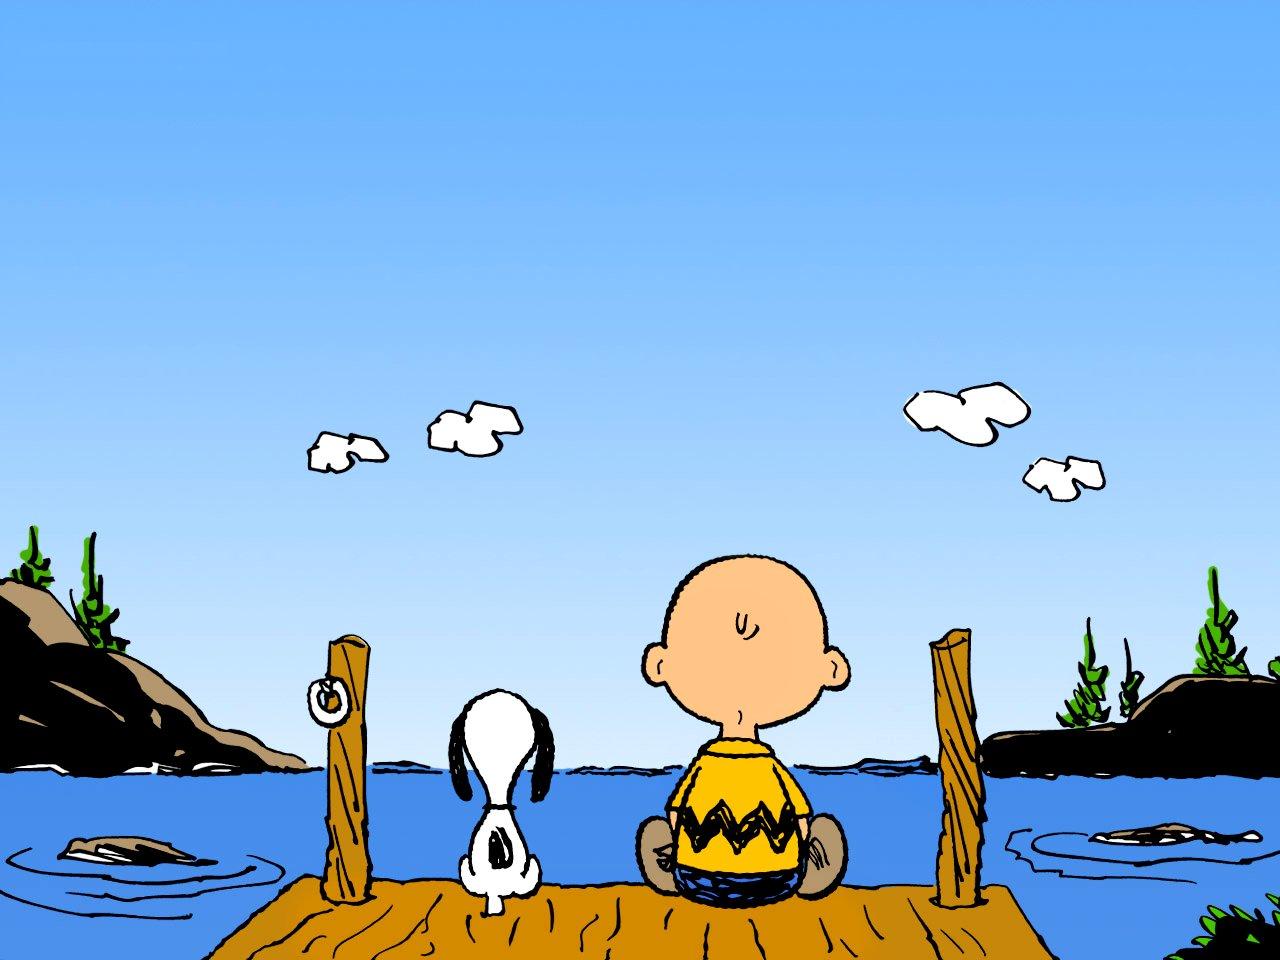 Snoopy Charlie Wallpaper 1280x960 Snoopy Charlie Brown Peanuts 1280x960